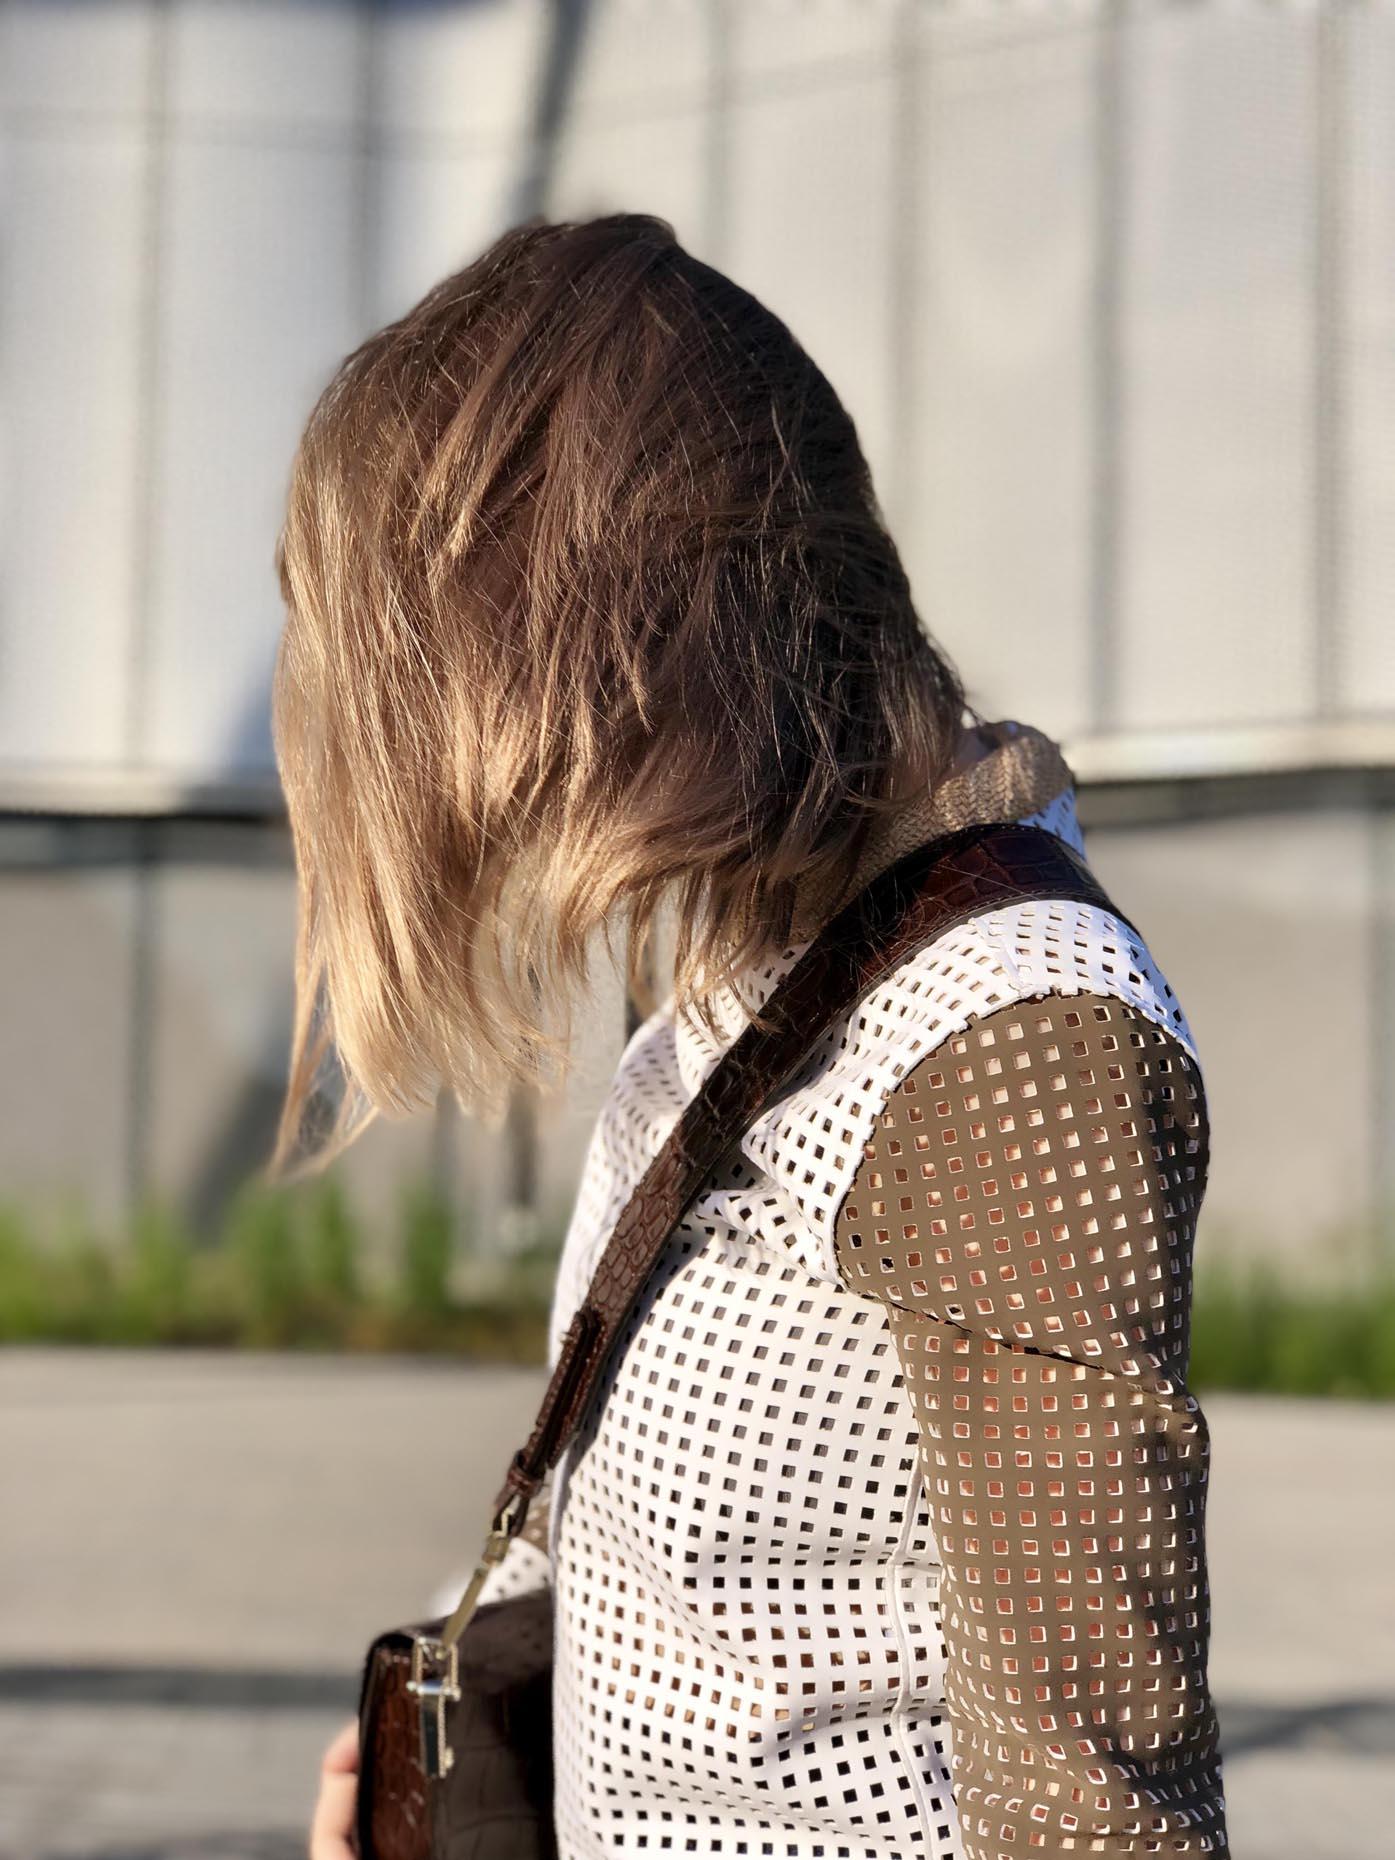 jw anderson top, saddle bag zofia chylak, vagabond shoes by Fashion Art Media